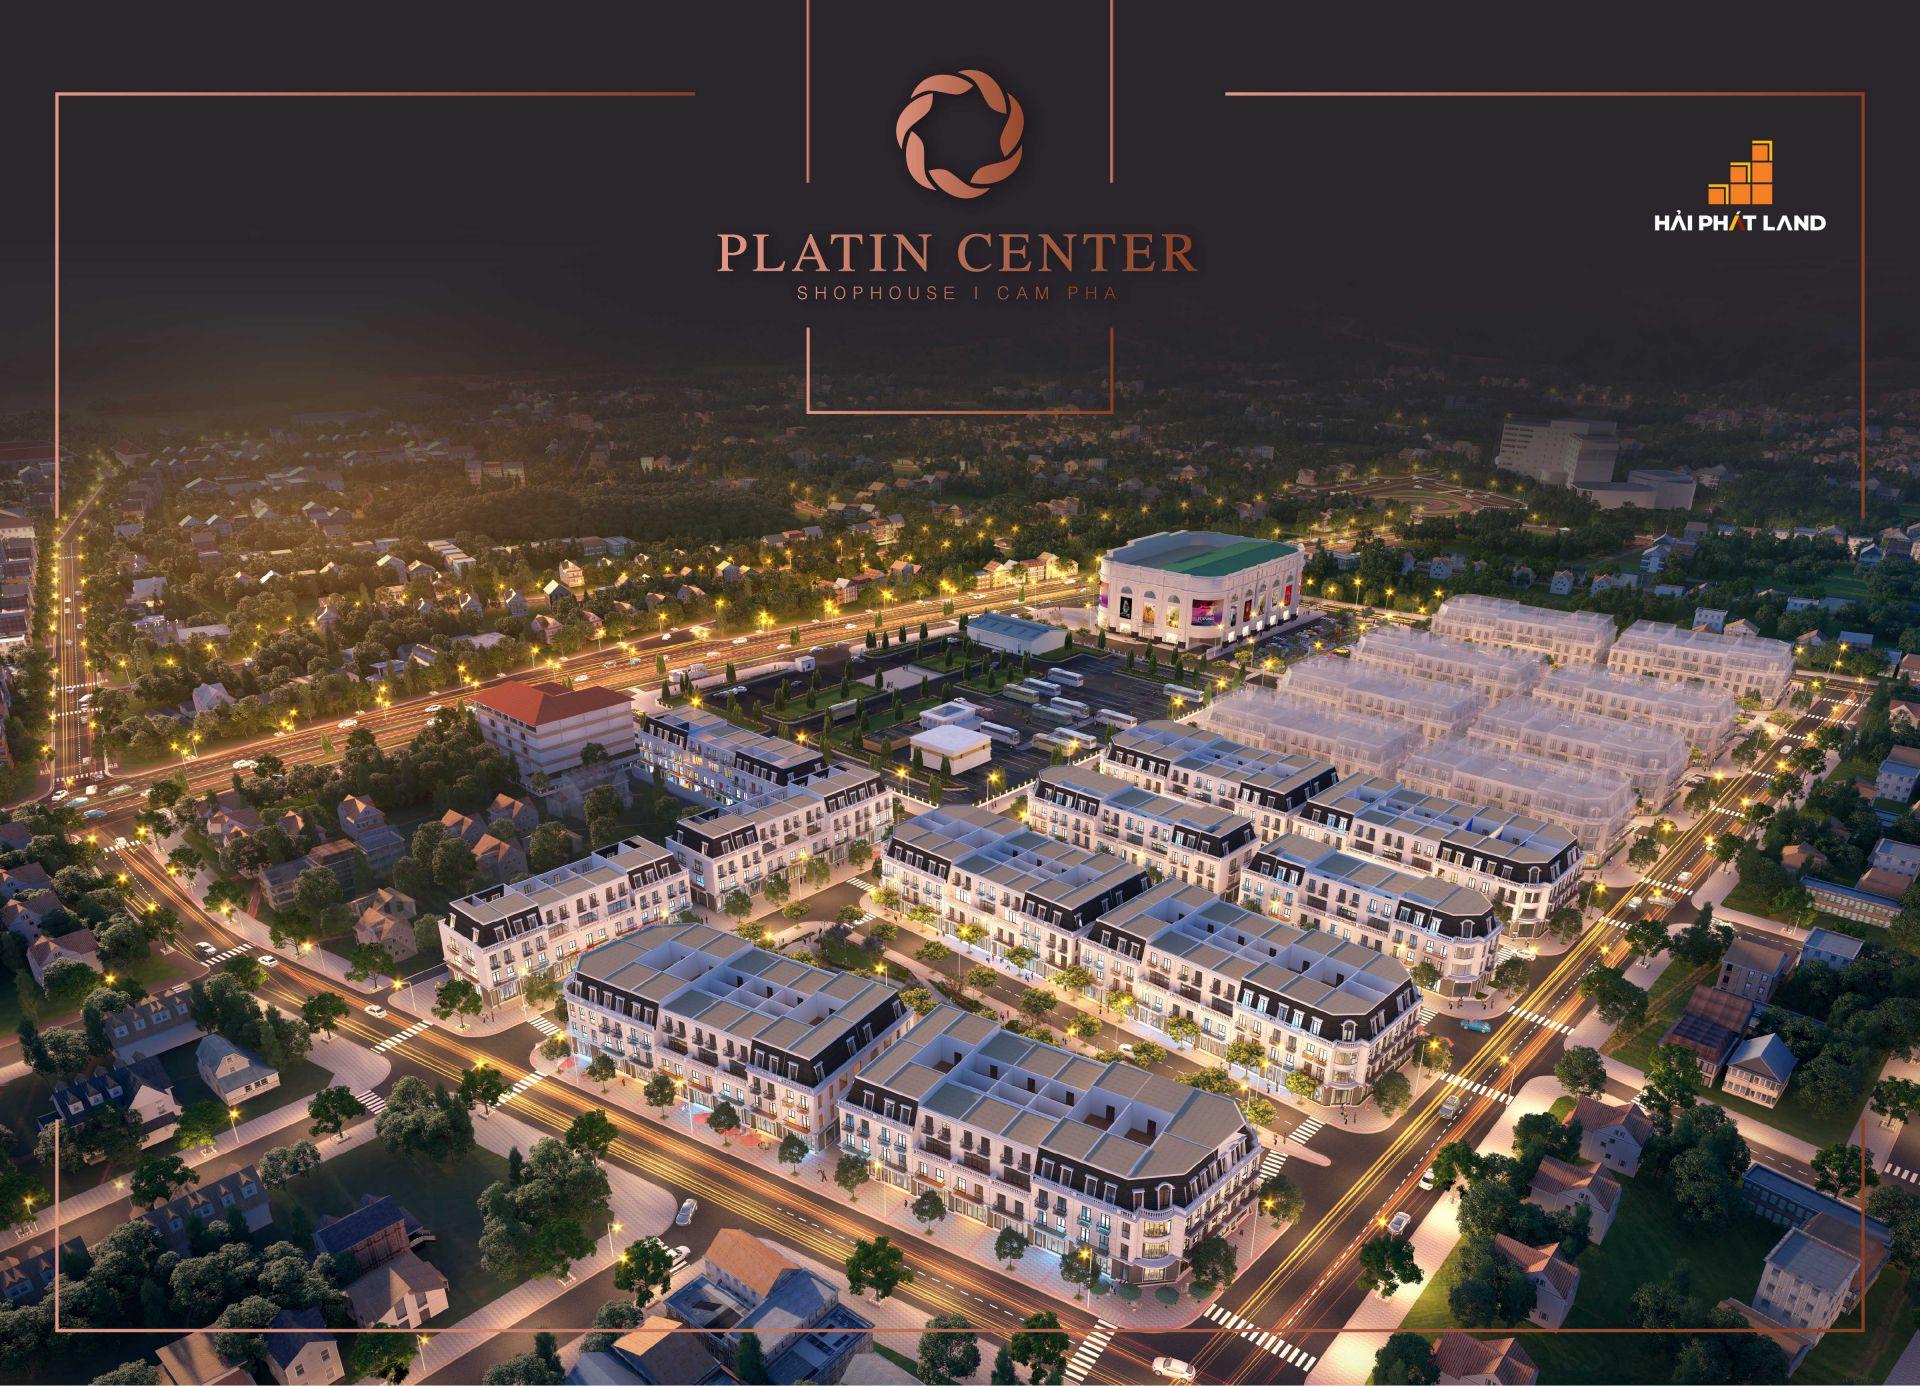 Phối cảnh dự án Shophouse Platin Center Cẩm Phả